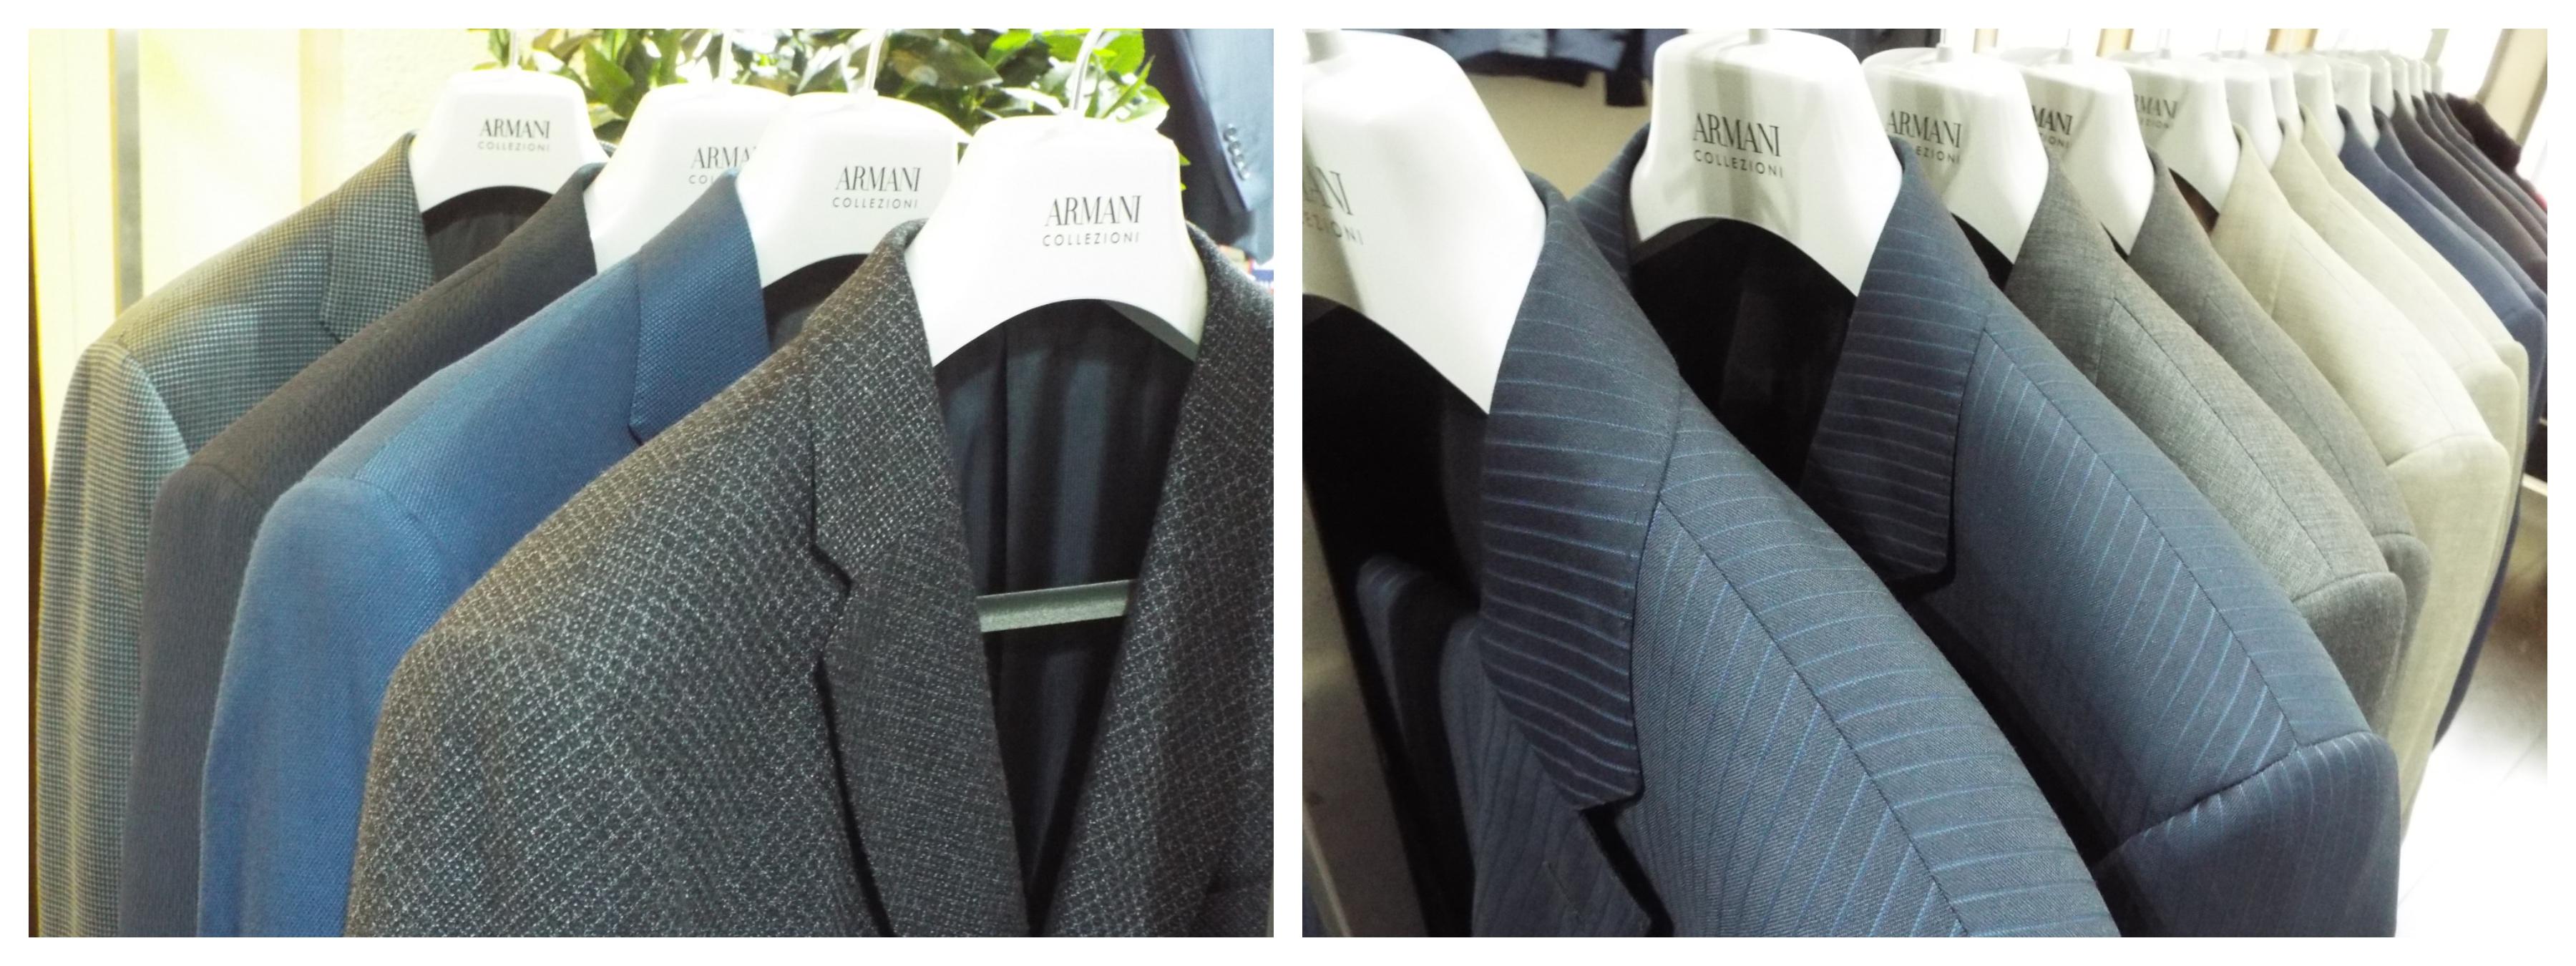 desinger menswear sale armani suits